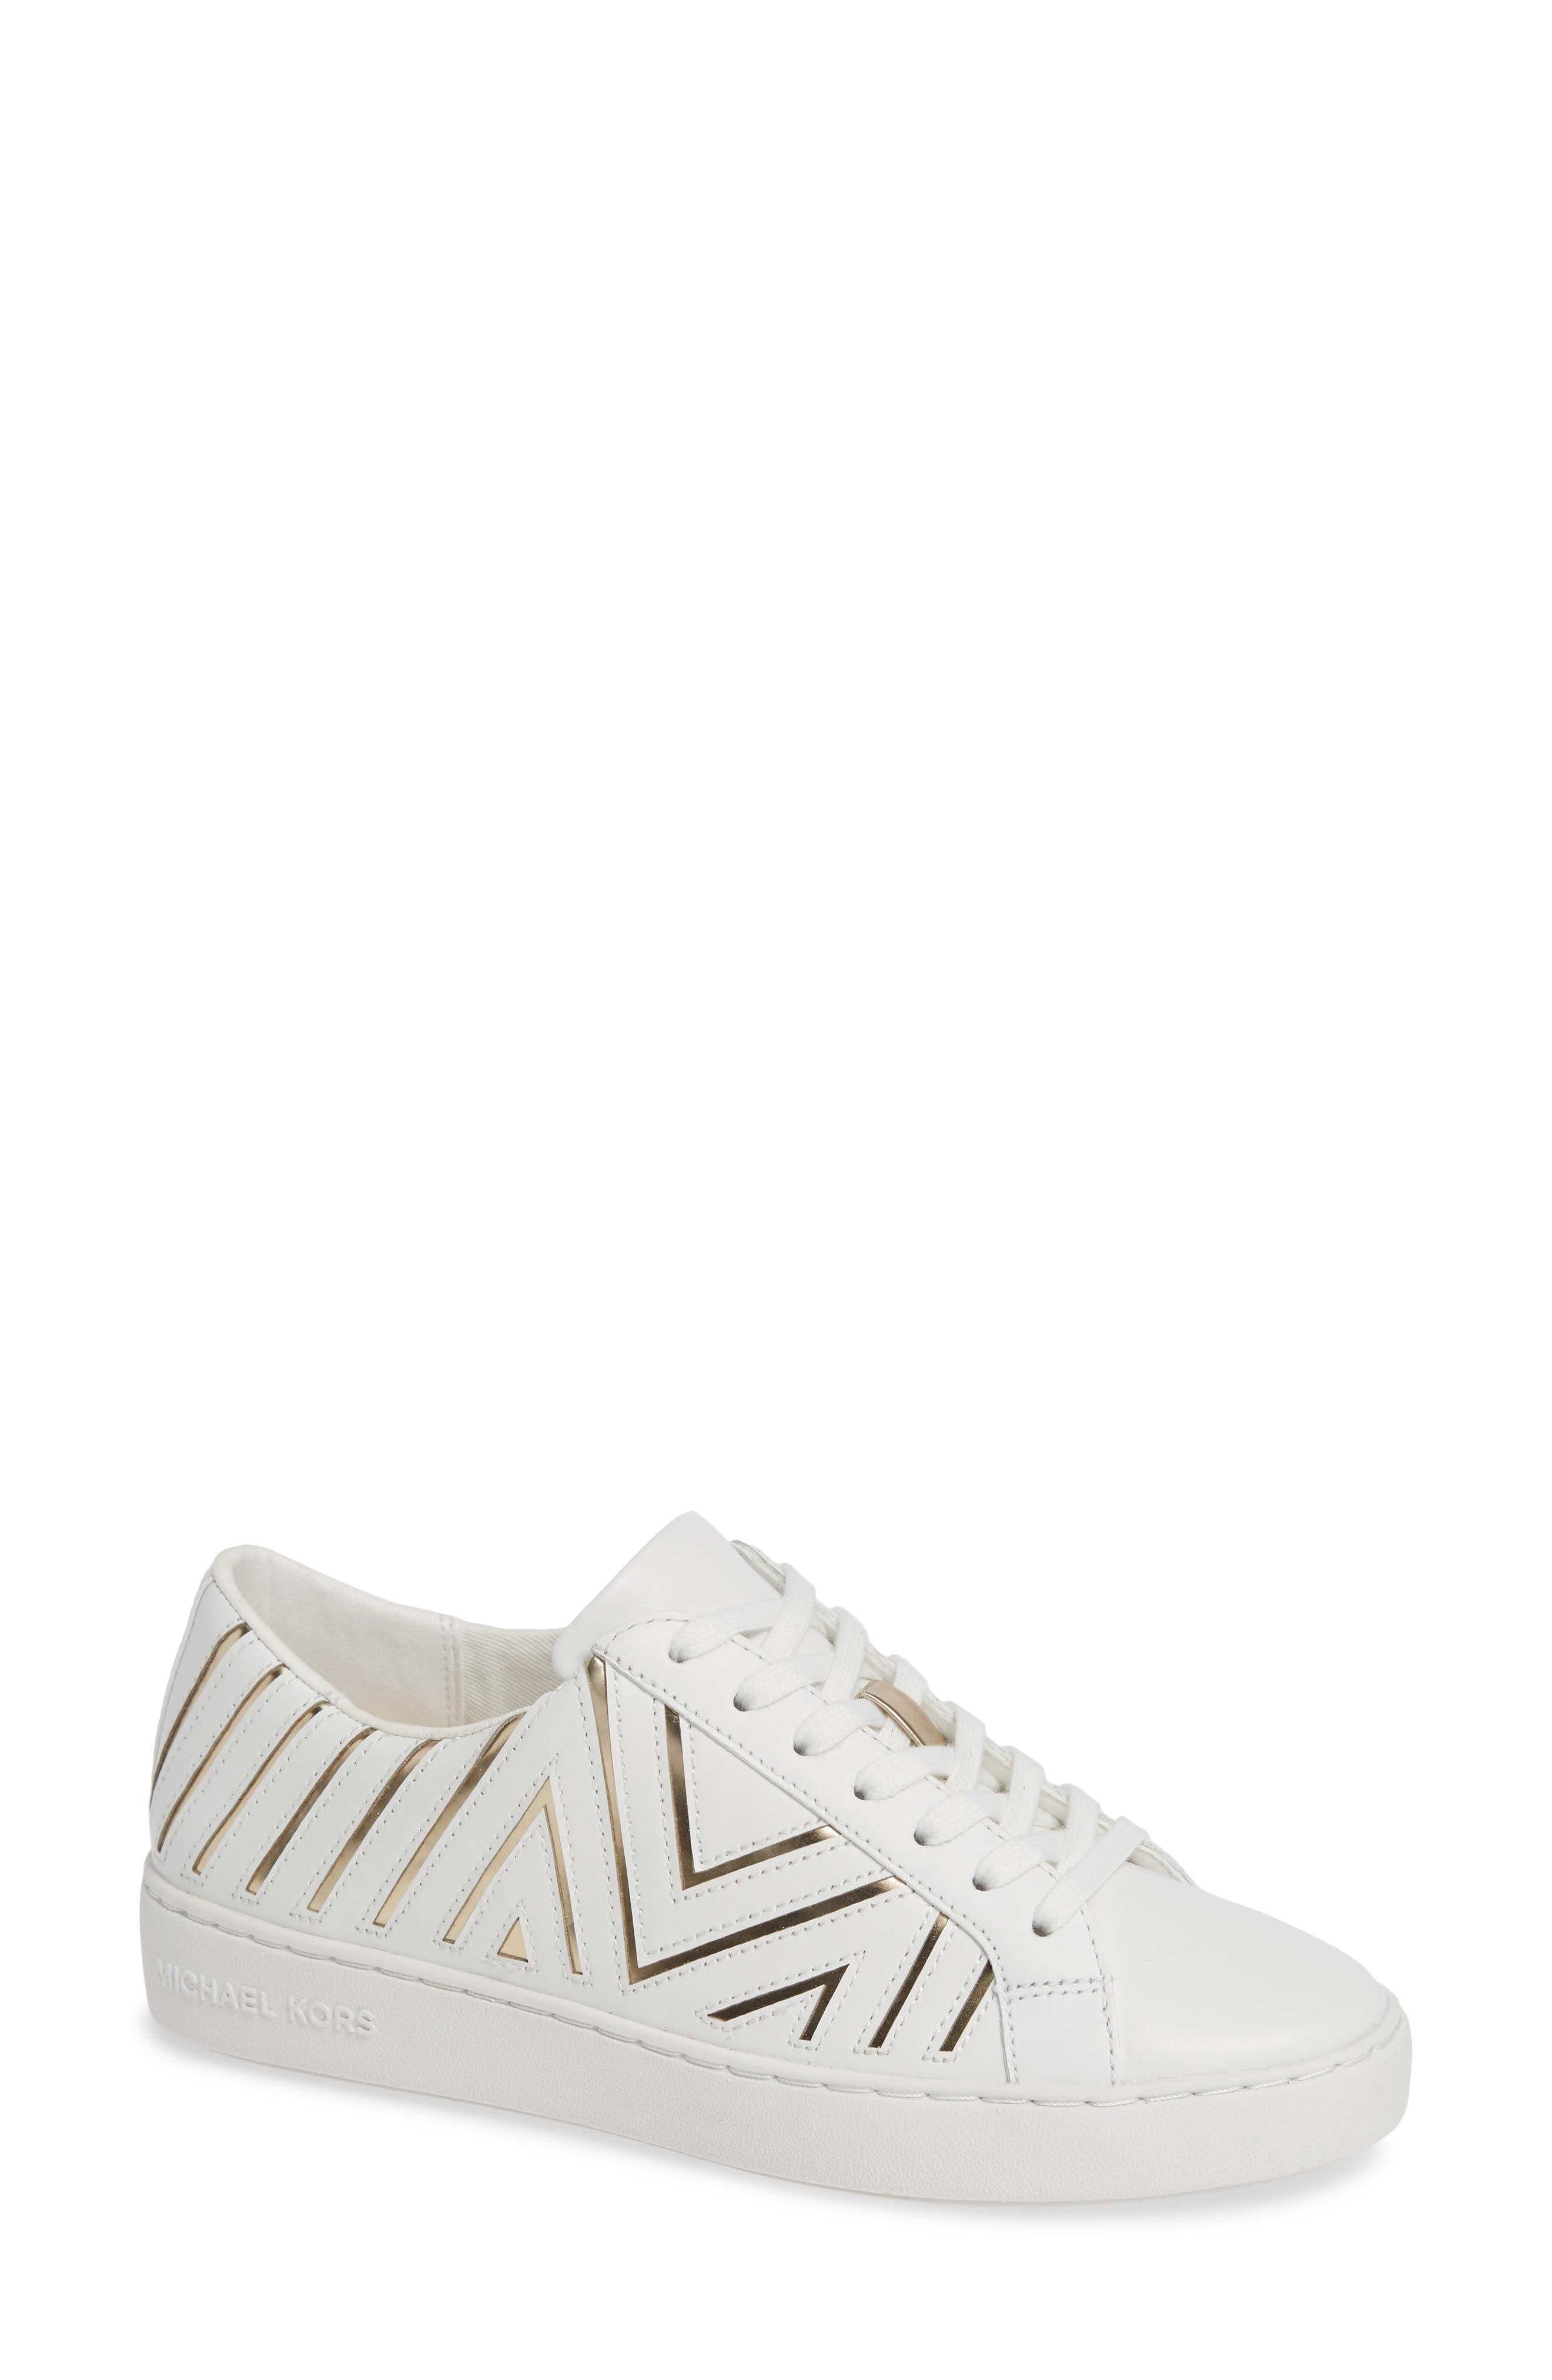 MICHAEL MICHAEL KORS,                             Whitney Sneaker,                             Main thumbnail 1, color,                             100